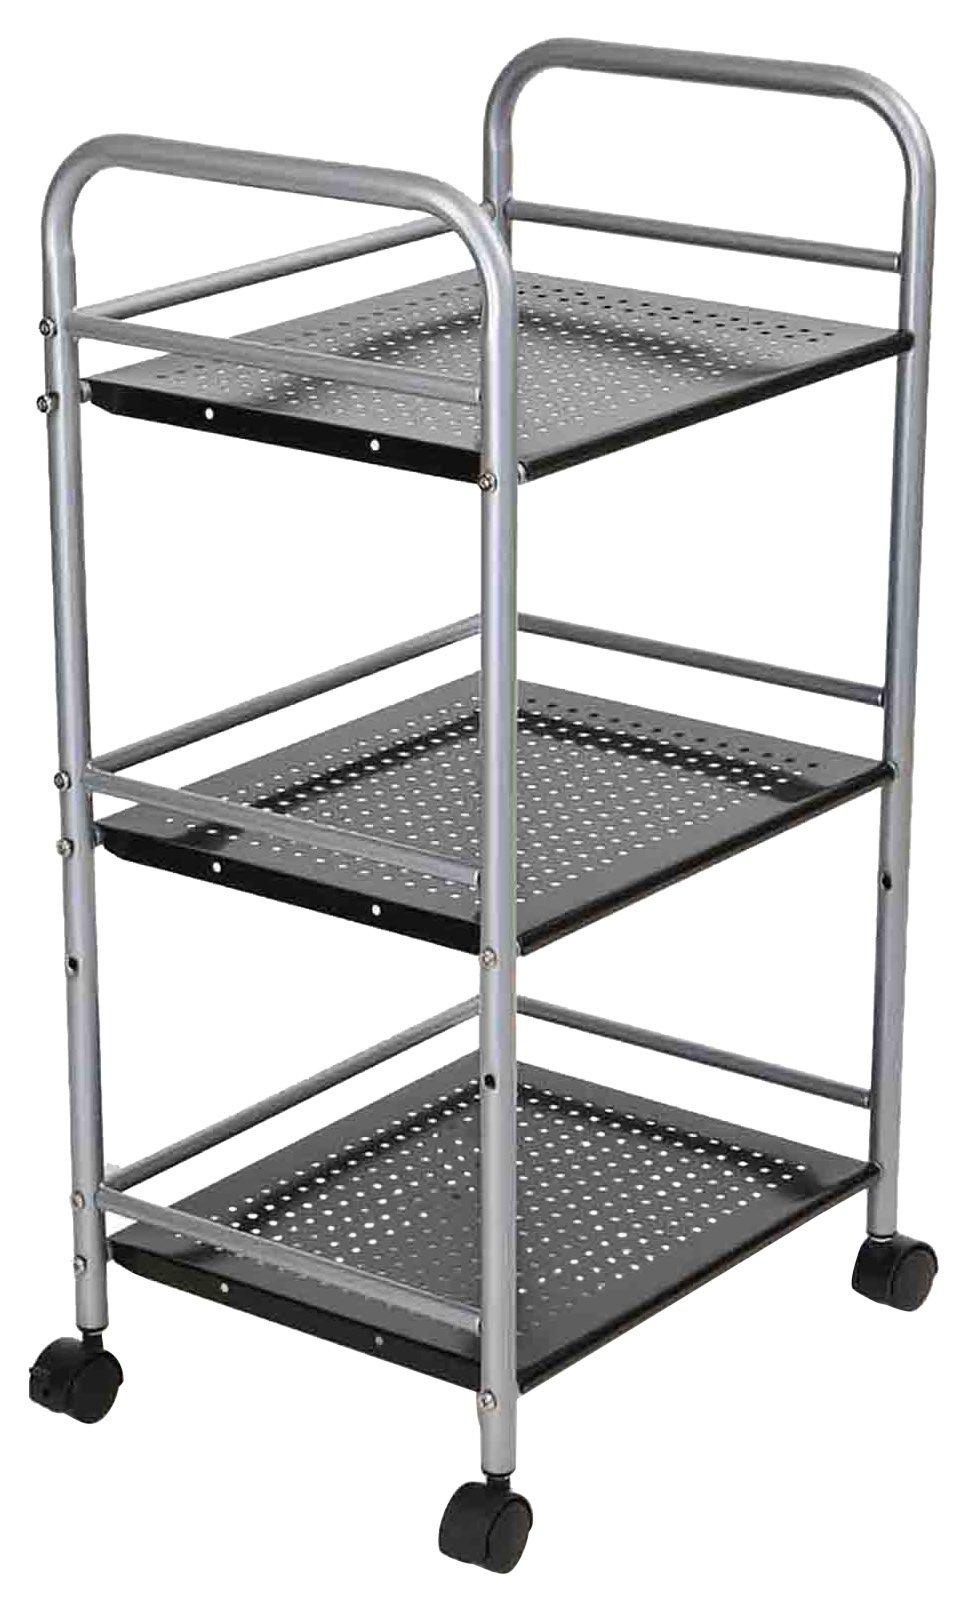 Mind Reader 3 Tier Metal Kitchen Trolley, Utility Cart, Silver